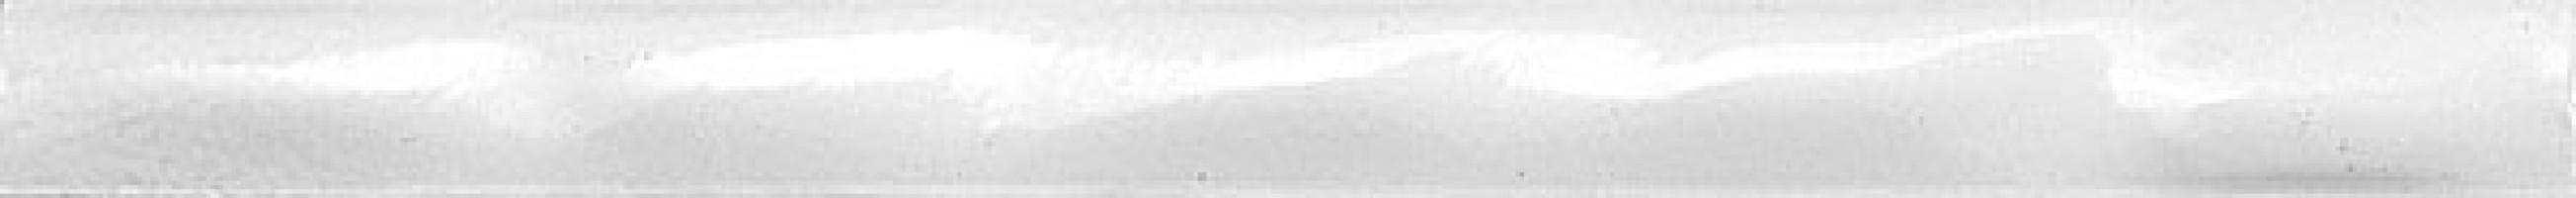 Бордюр 107 Волна белый 25х2 Kerama Marazzi